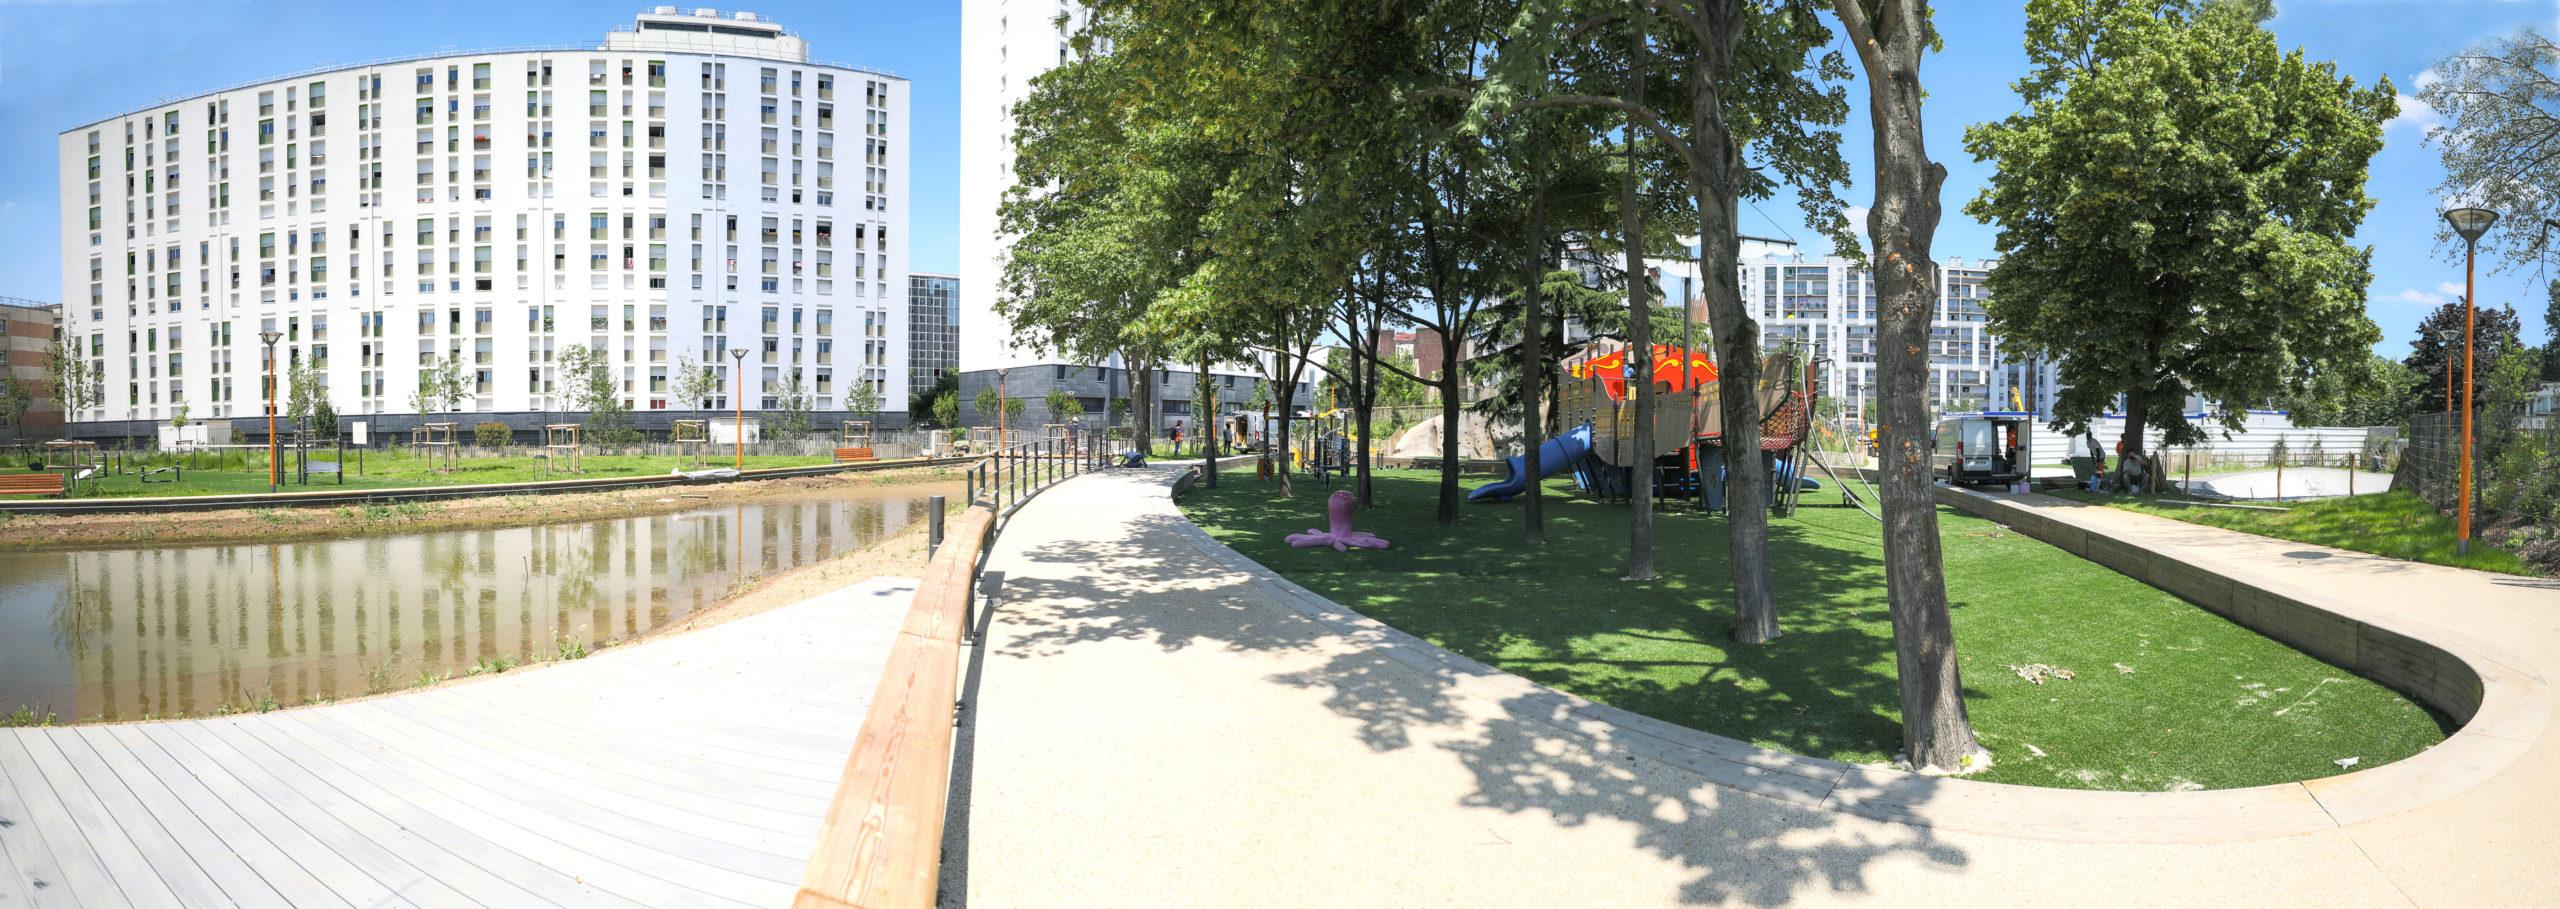 Bassin du parc Diderot